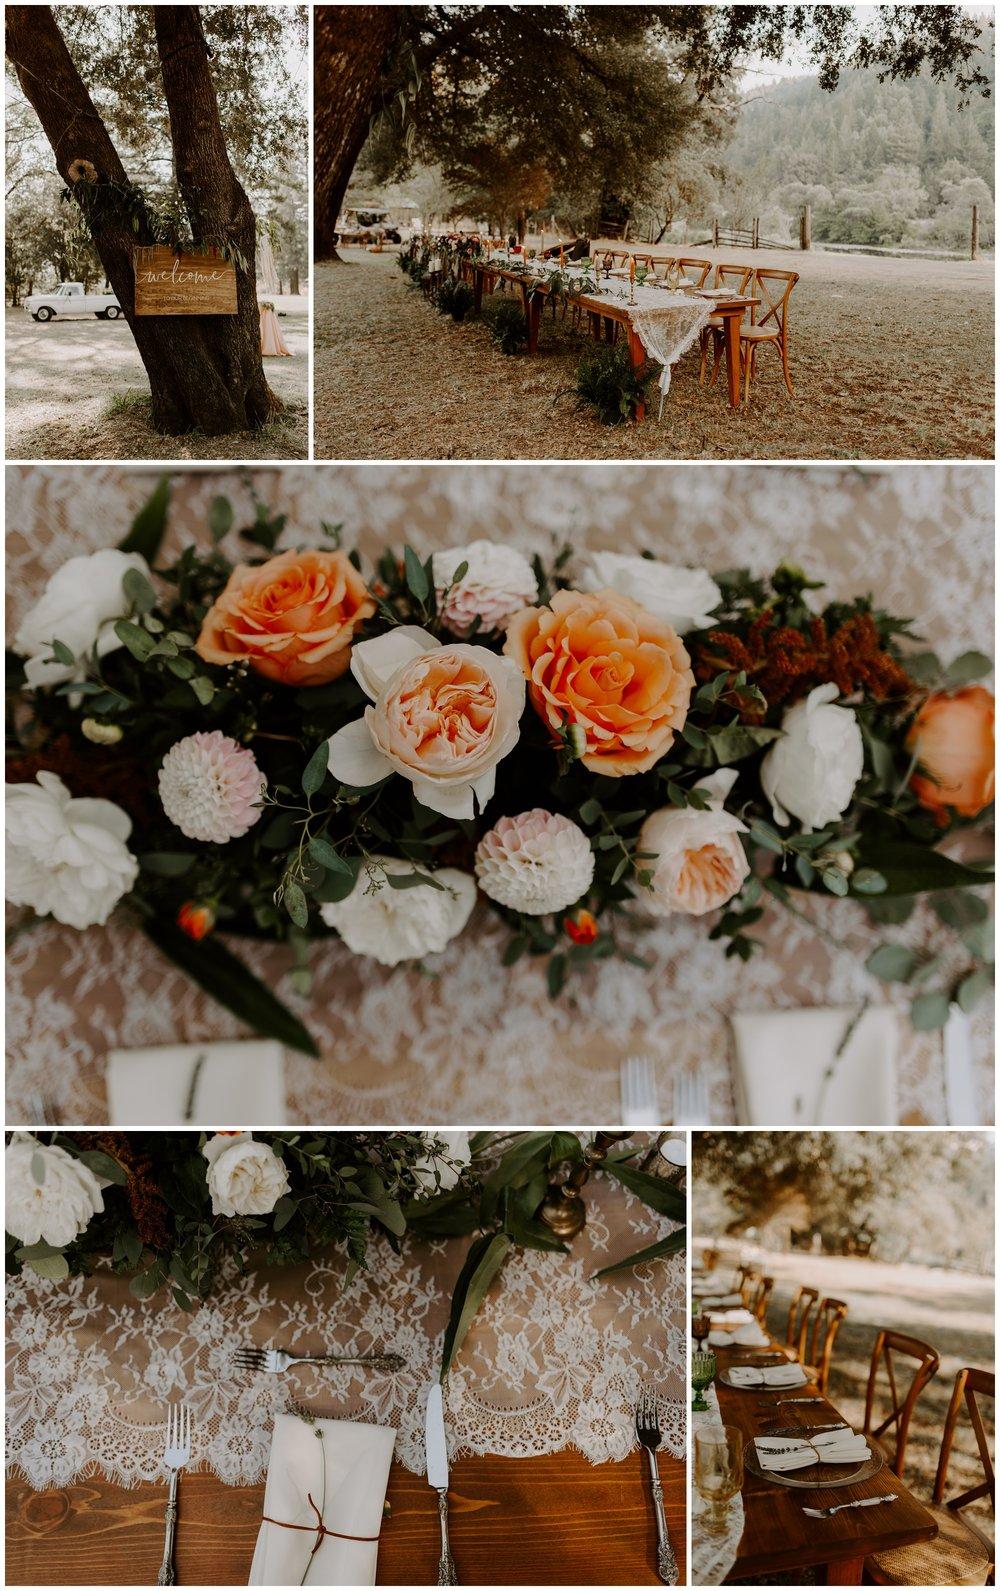 Redwood Festival Wedding Humbolt California - Jessica Heron Images_0060.jpg